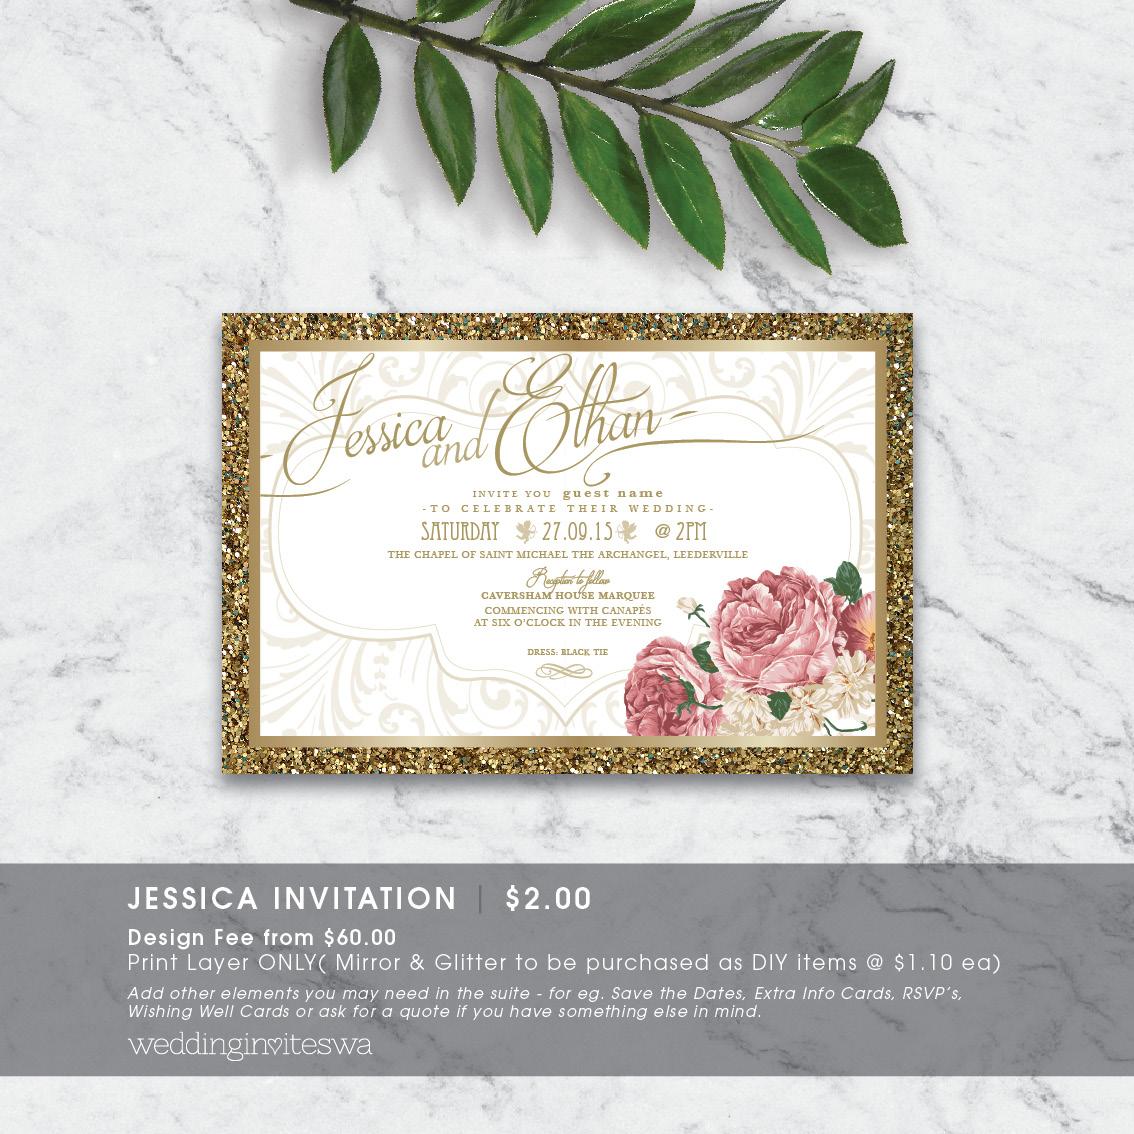 JESSICA_invite